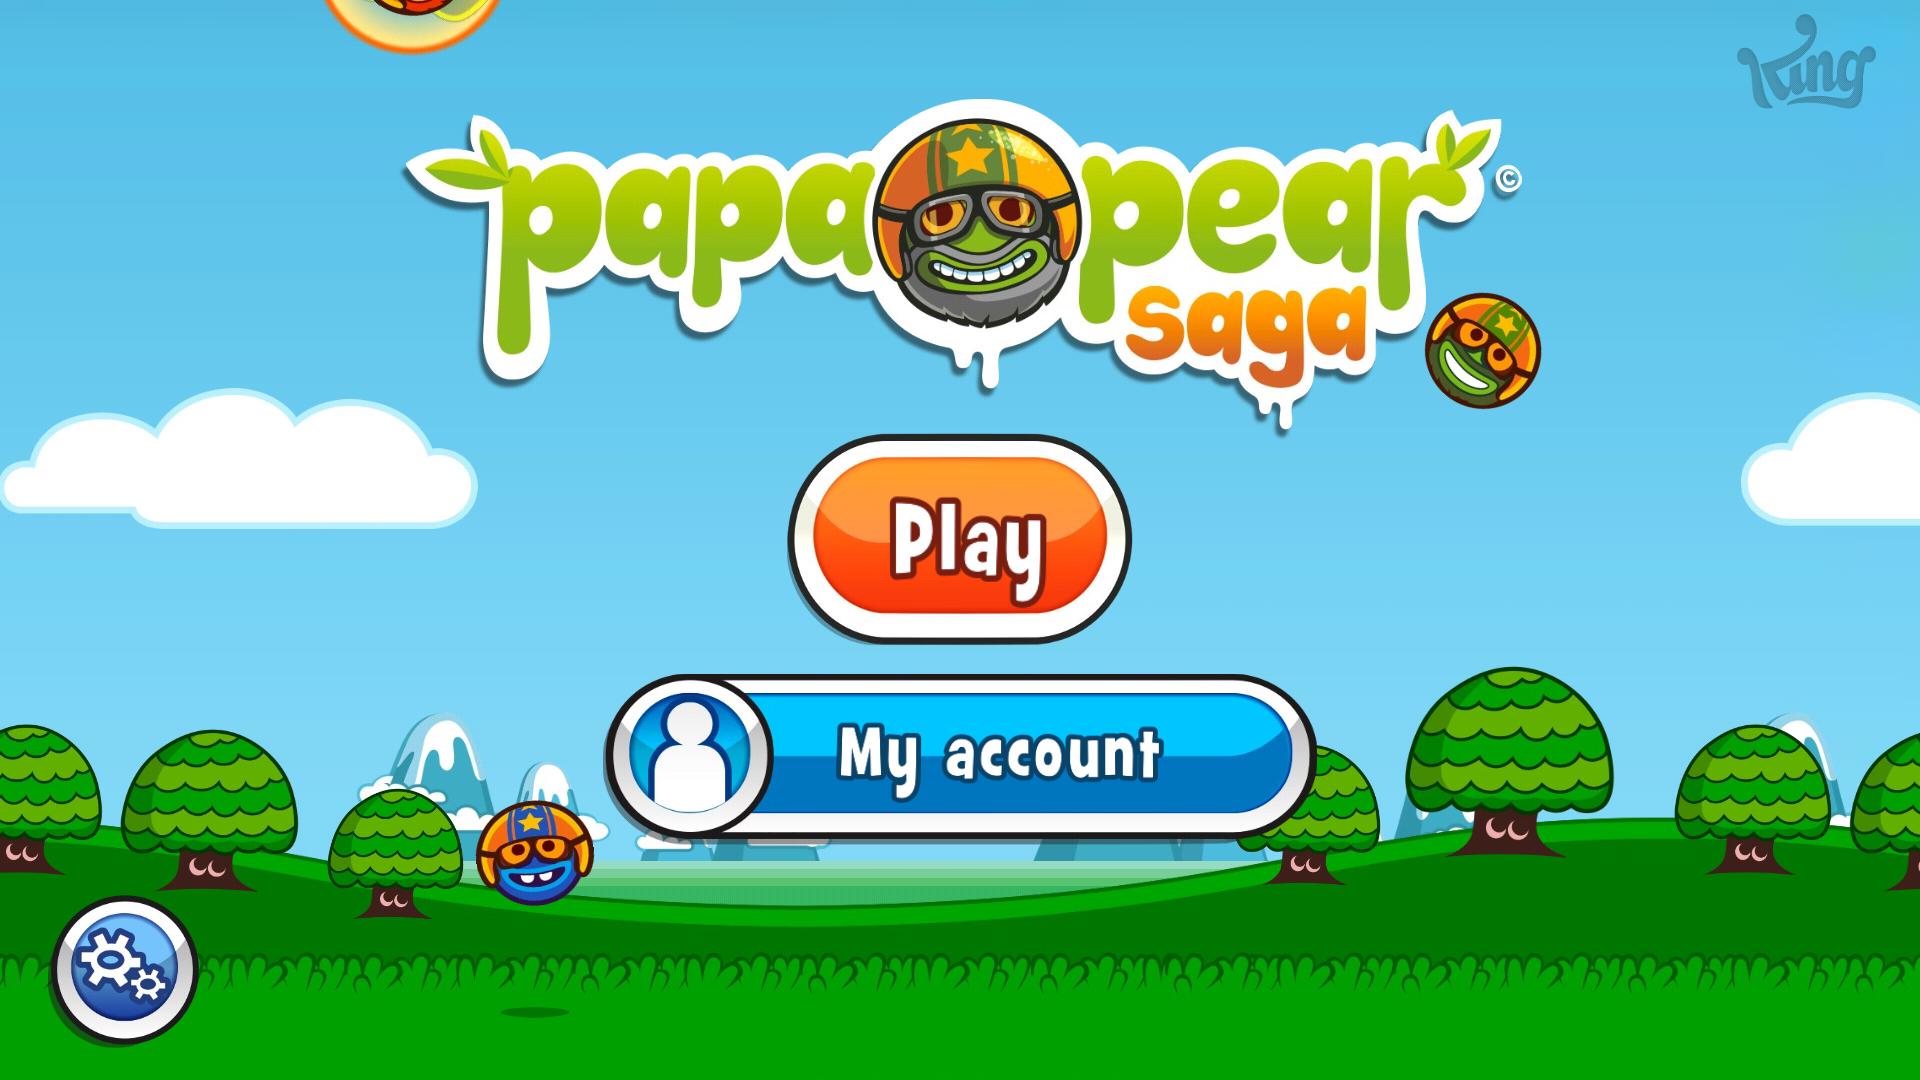 Papa Pear Saga: Level 001 12,410 points